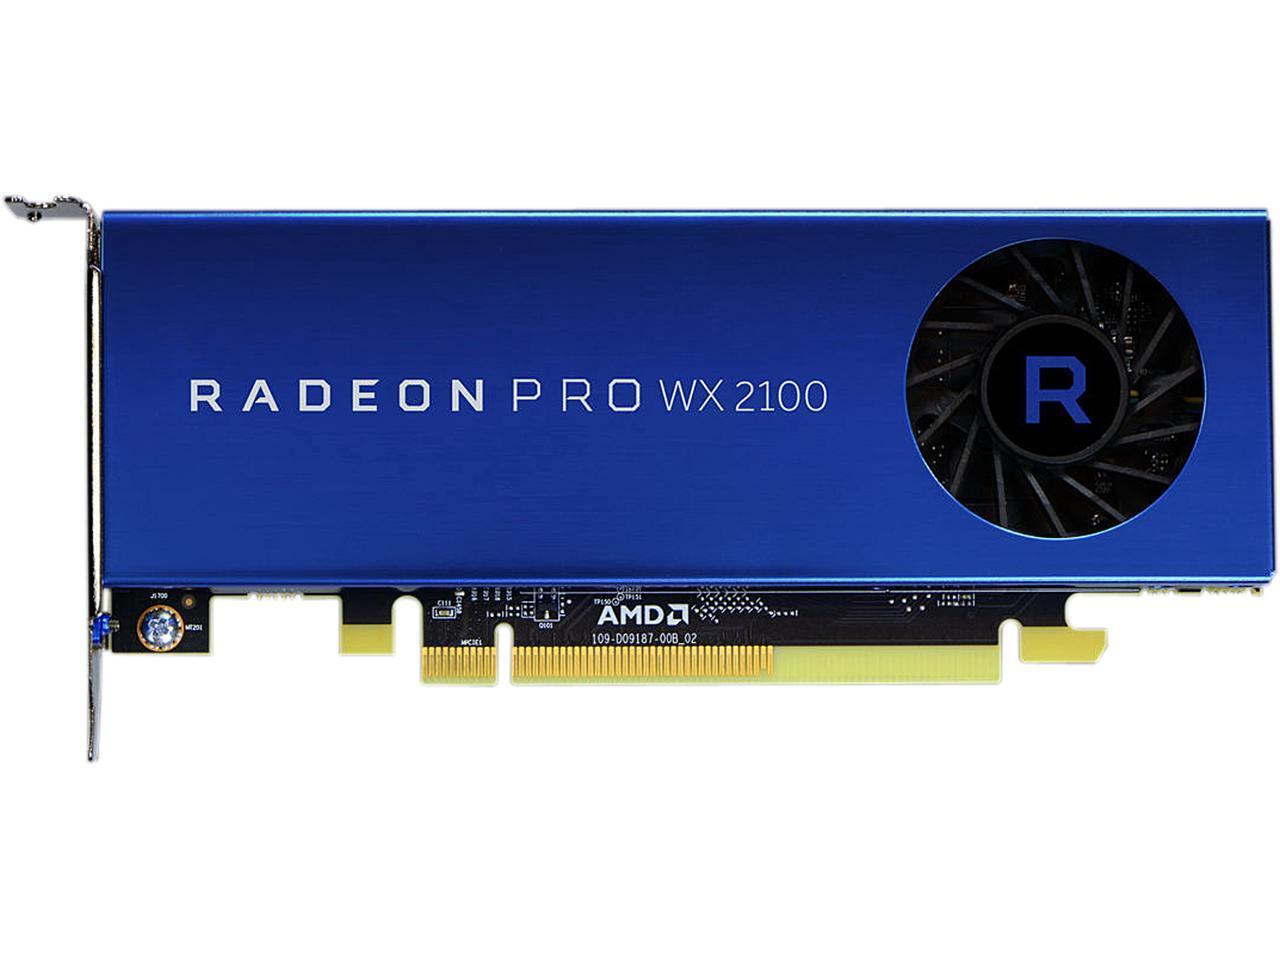 AMD Radeon Pro WX 2100 - 2GB GDDR5, 2xmDP, 1xDP